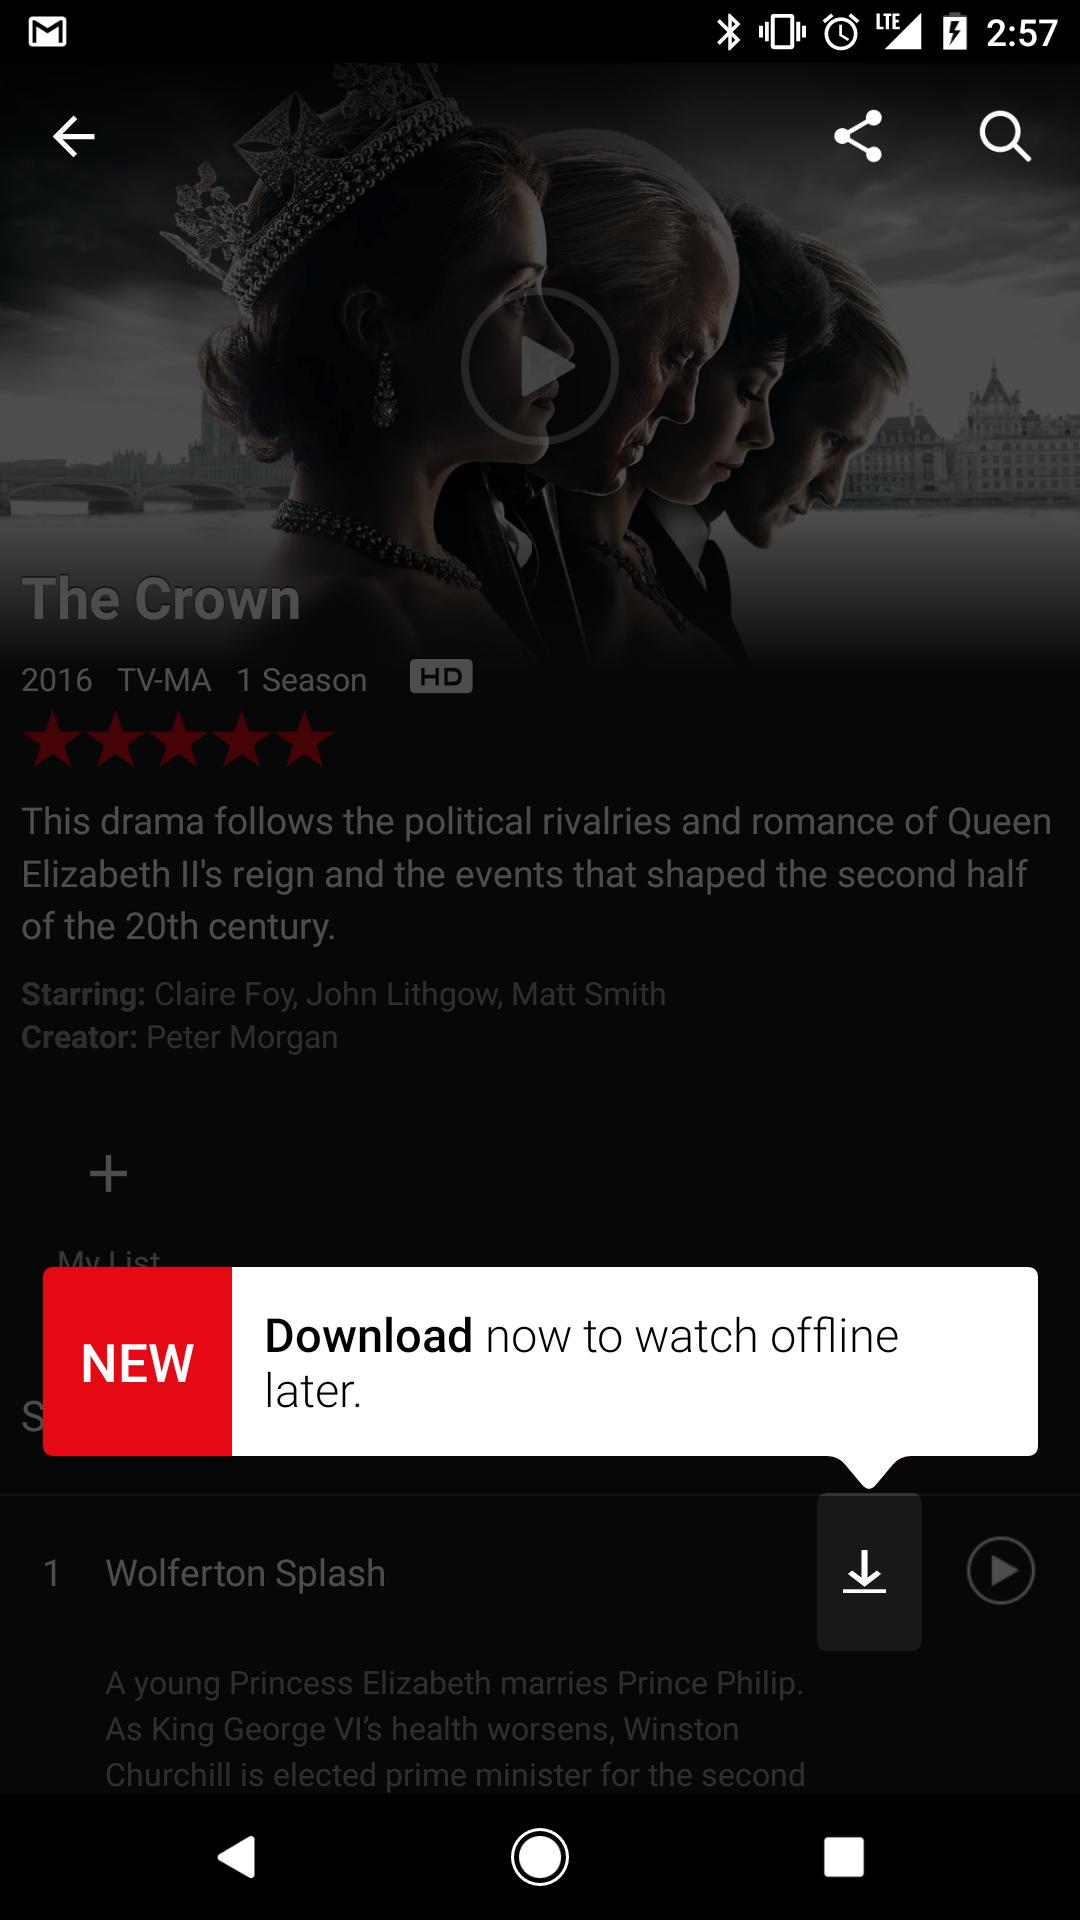 netflix download movies